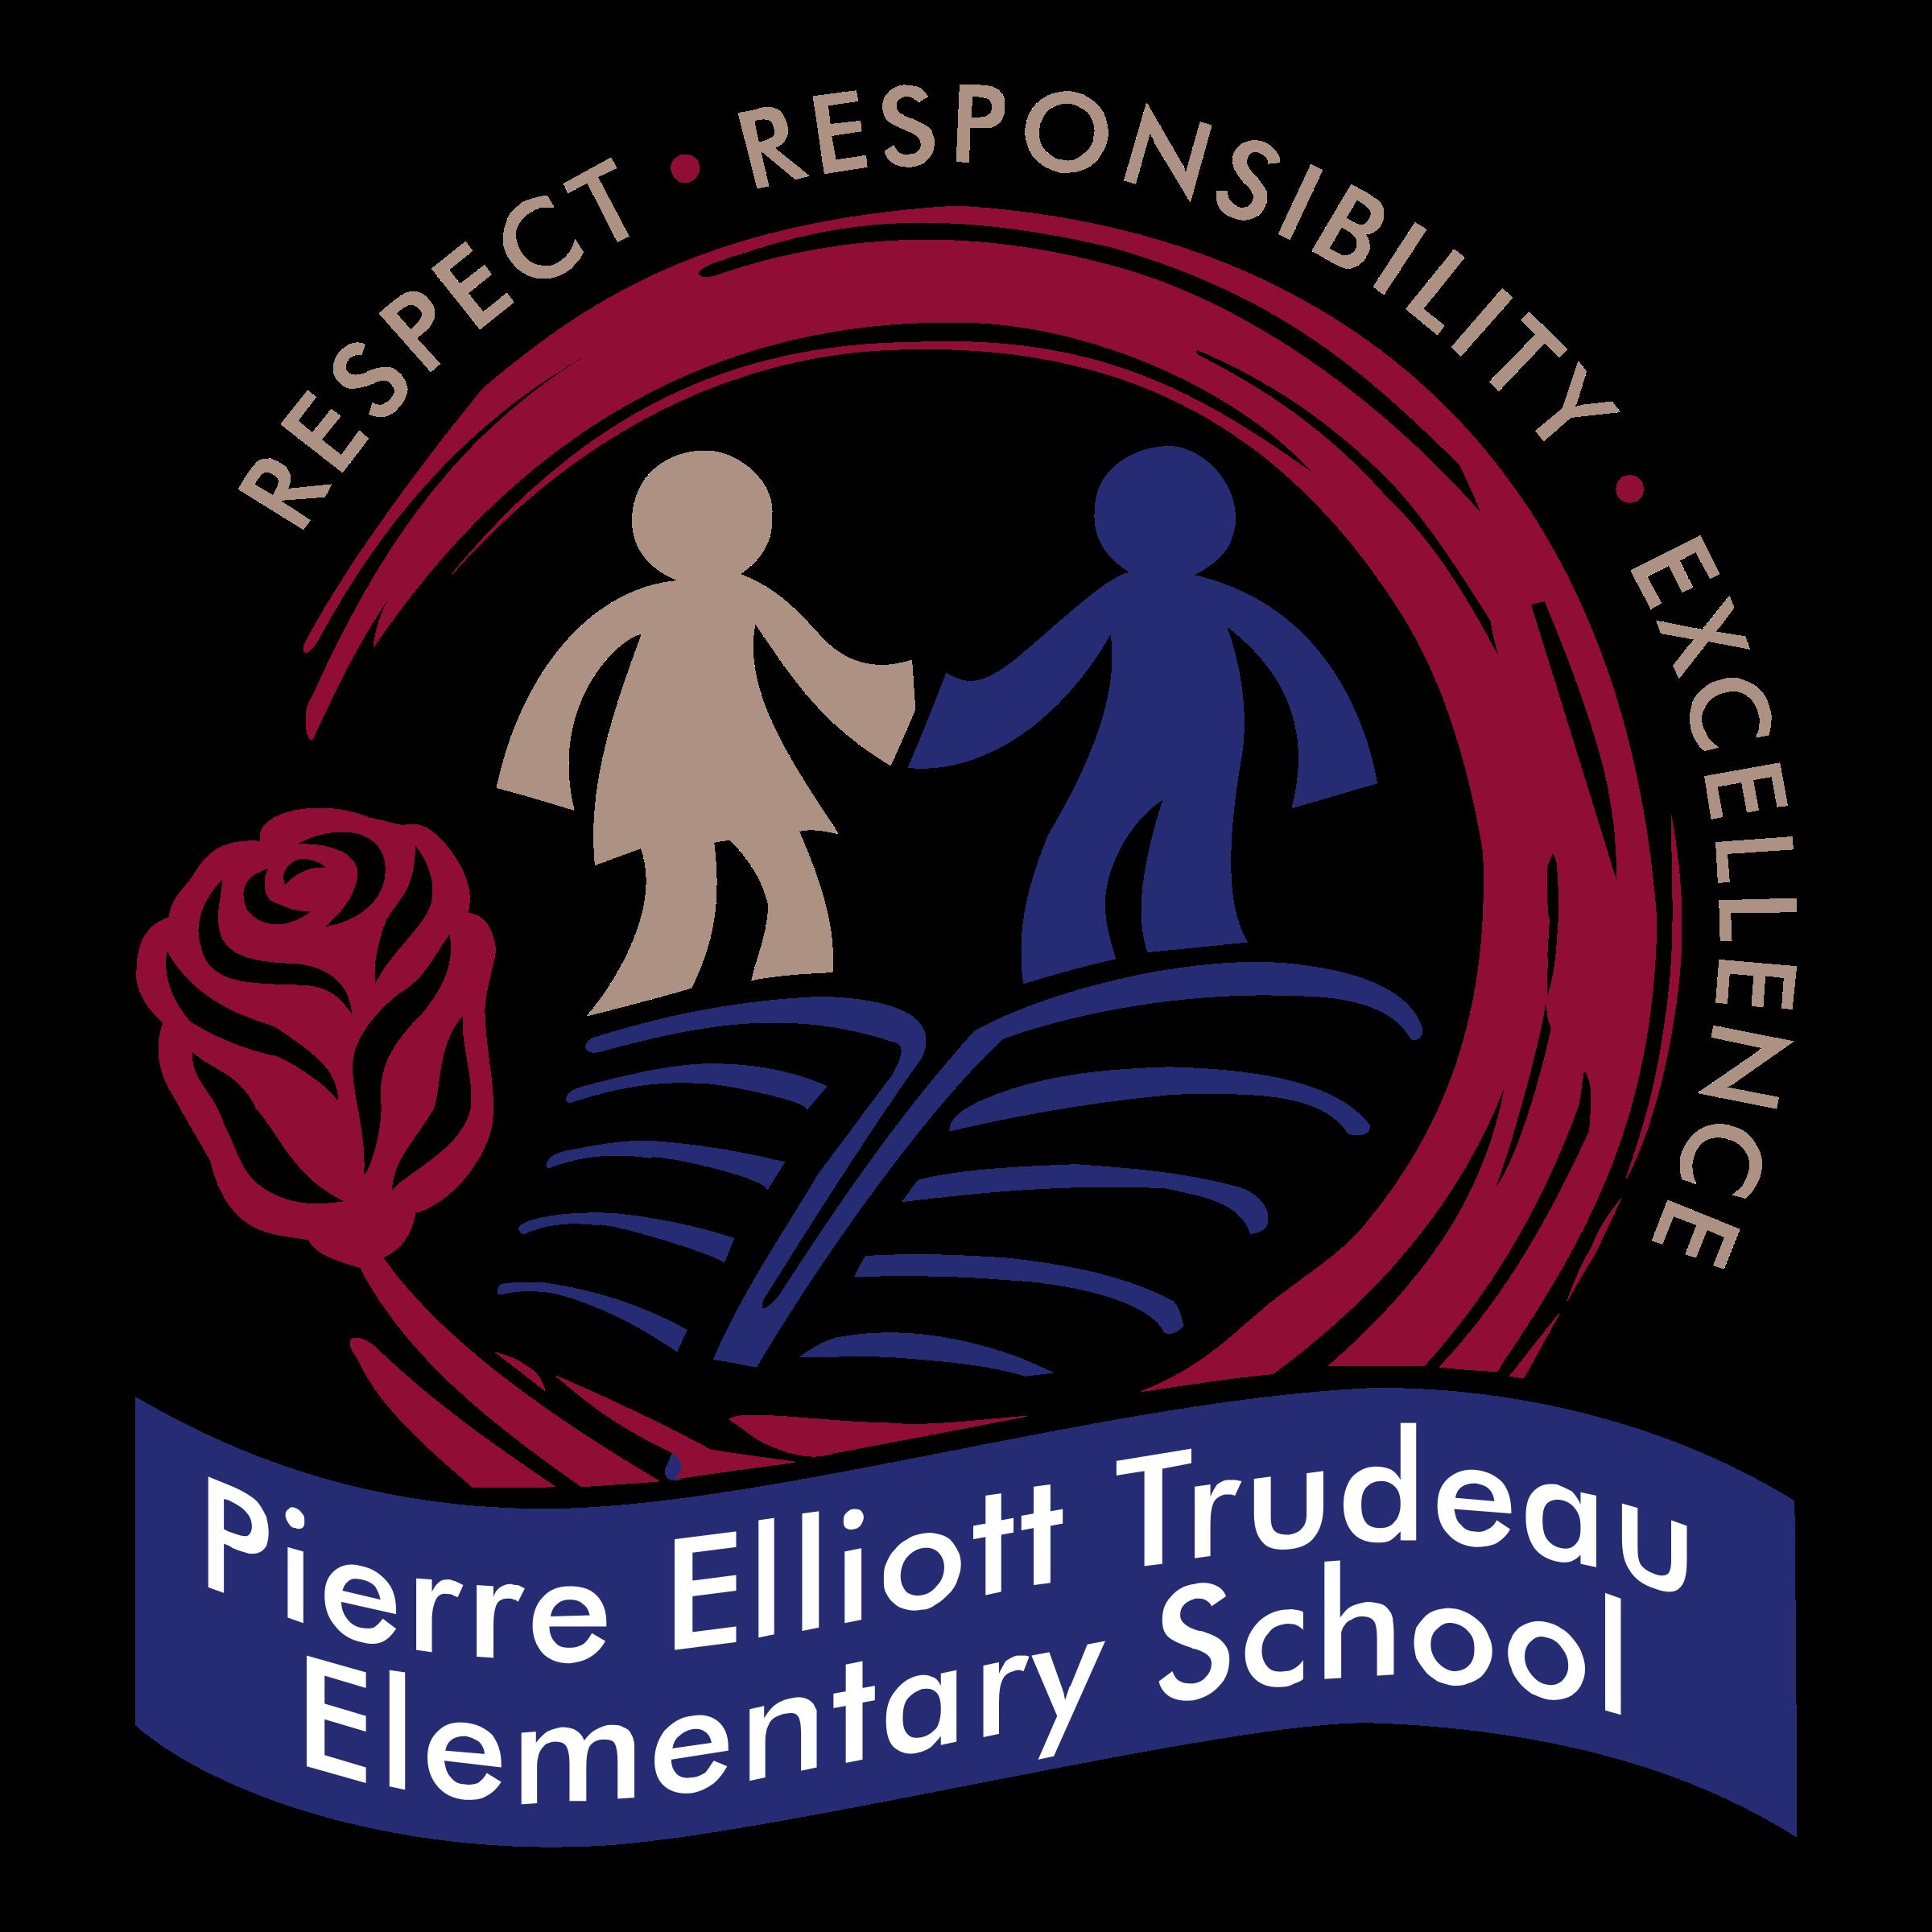 Pierre Elliott Trudeau Elementary School Logo Png Transparent Svg Vector Freebie Supply